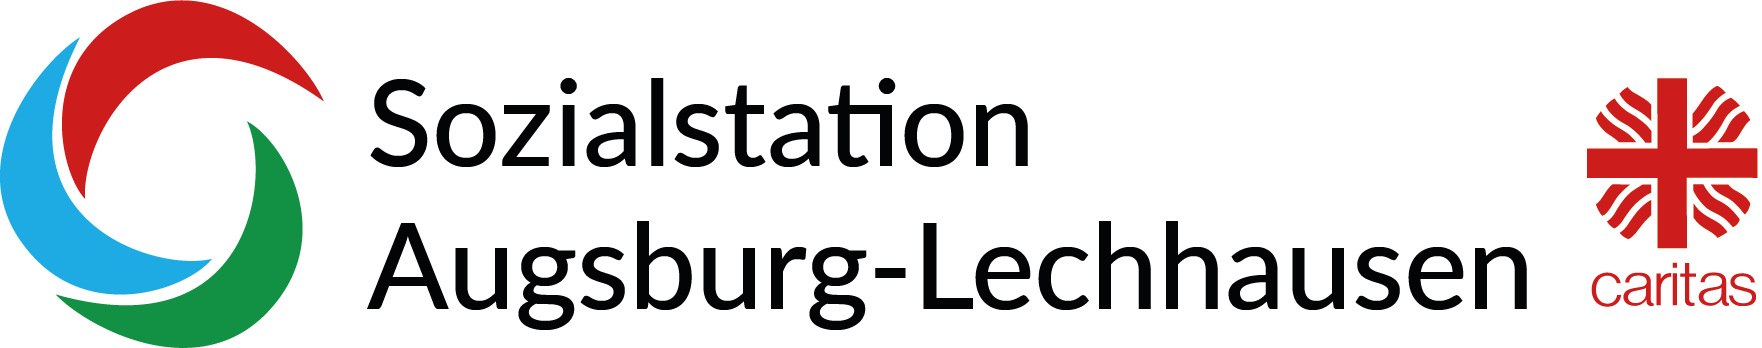 Sozialstation Augsburg-Lechhausen